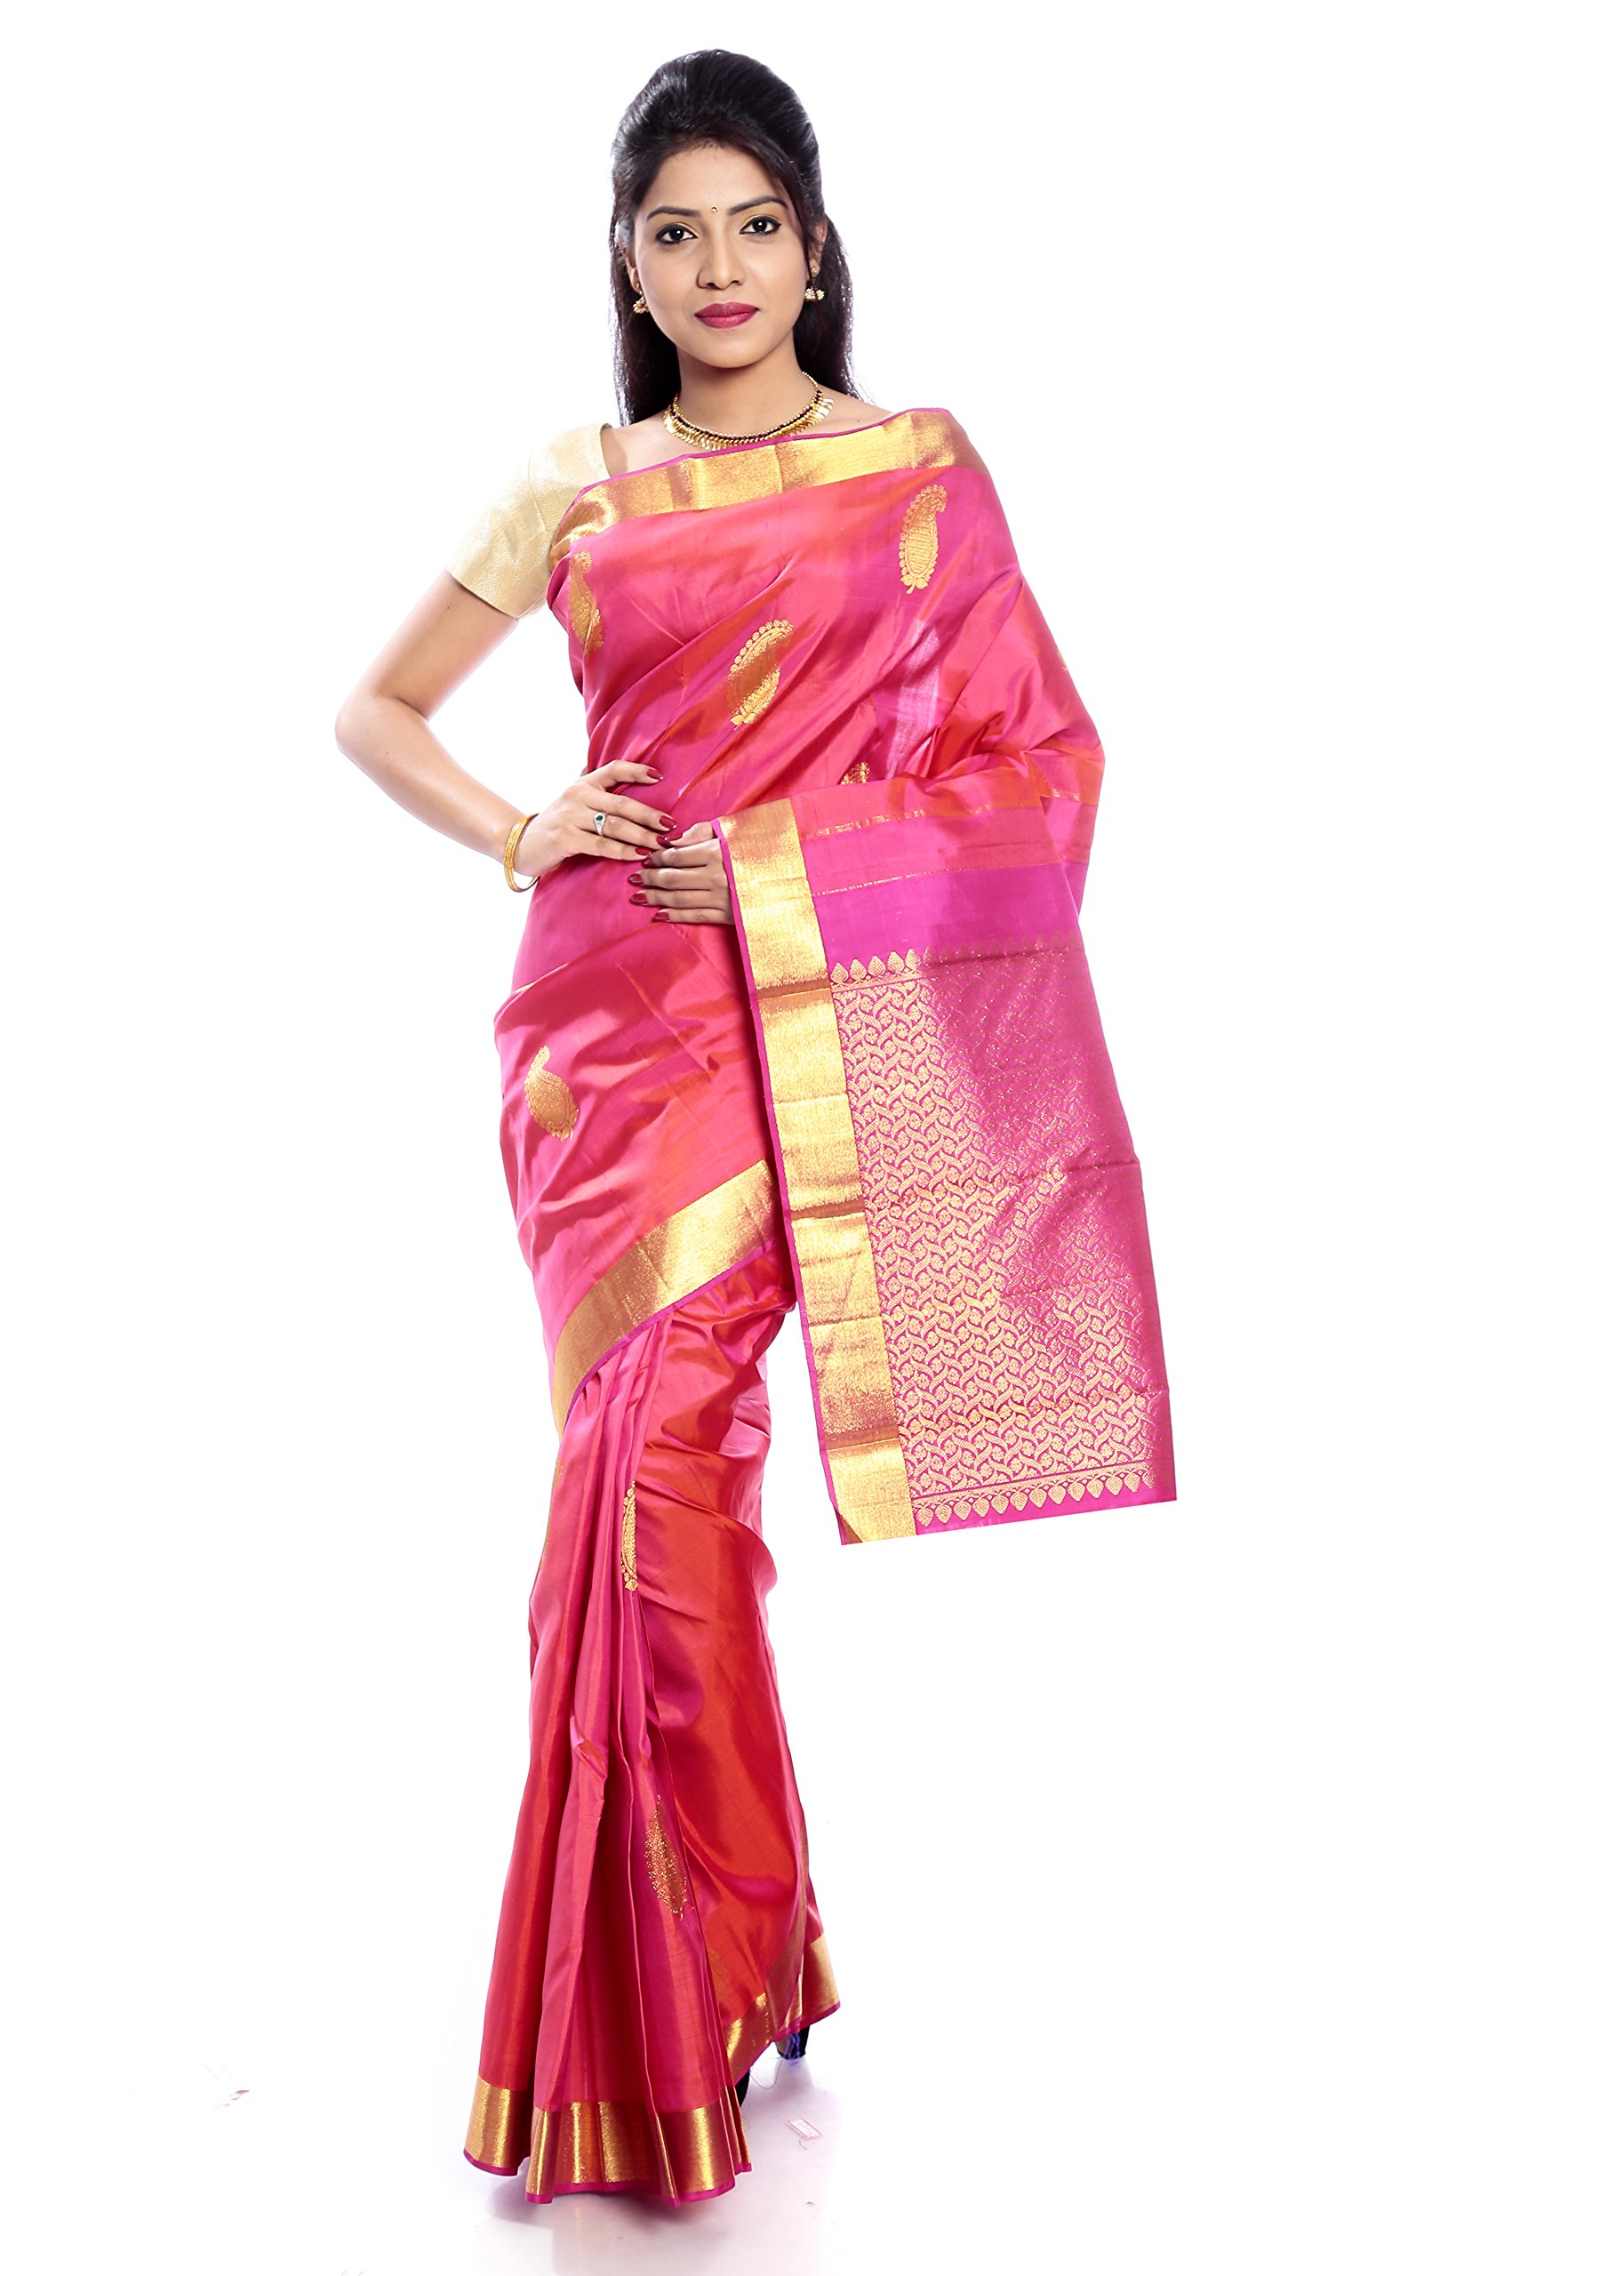 Mandakini — Indian Women's Kanchipuram - Handloom - Pure Silk Saree (Pink ) (MK227)